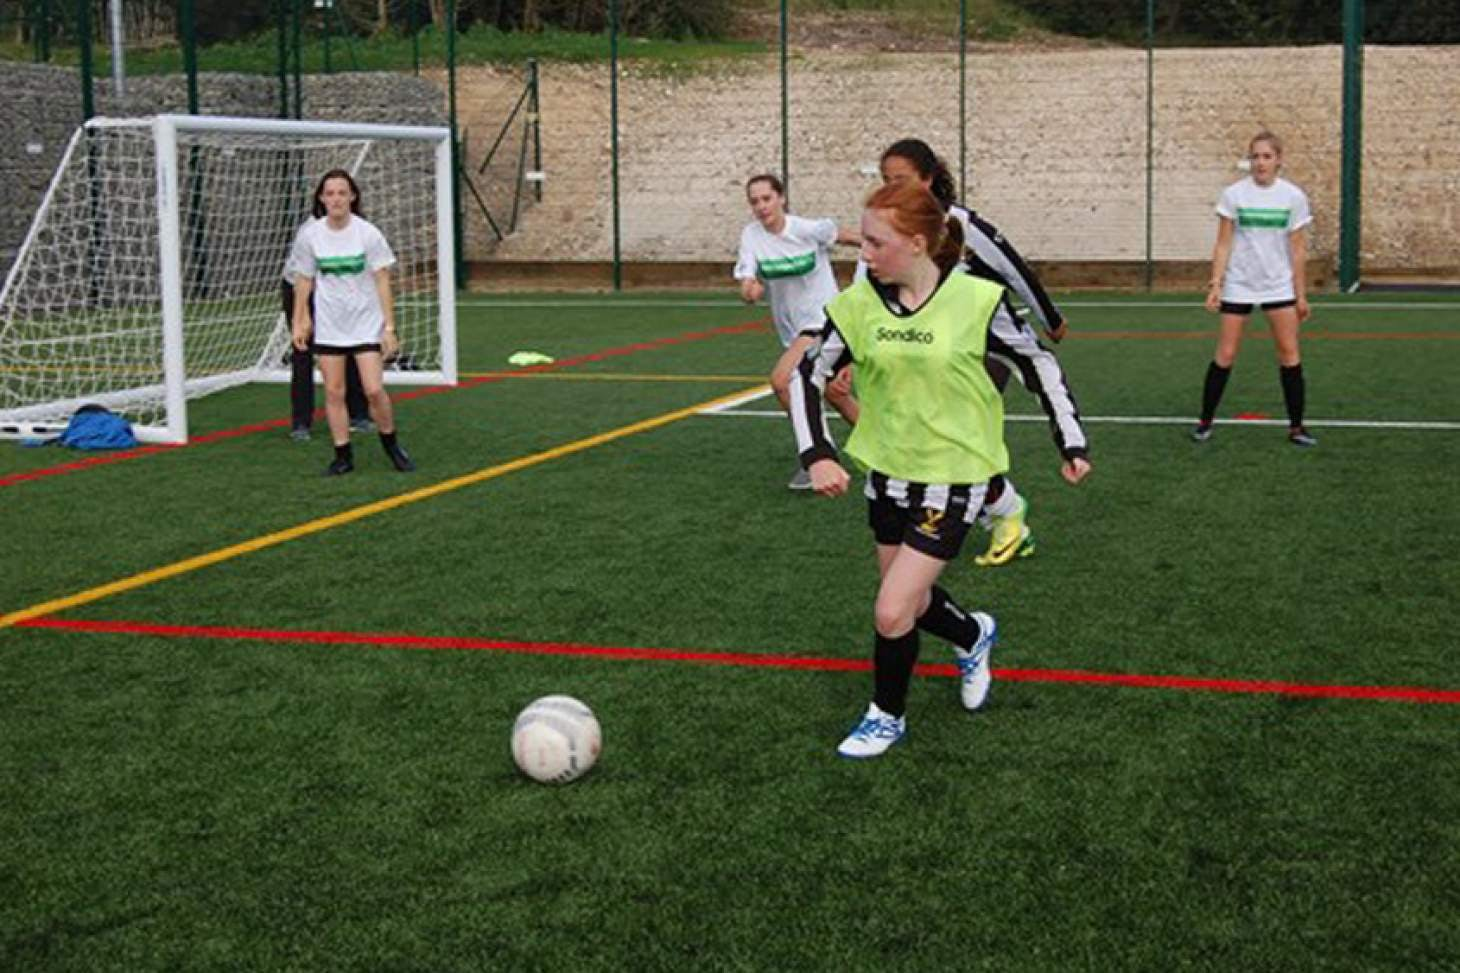 Dorothy Stringer School 11 a side | 3G Astroturf football pitch